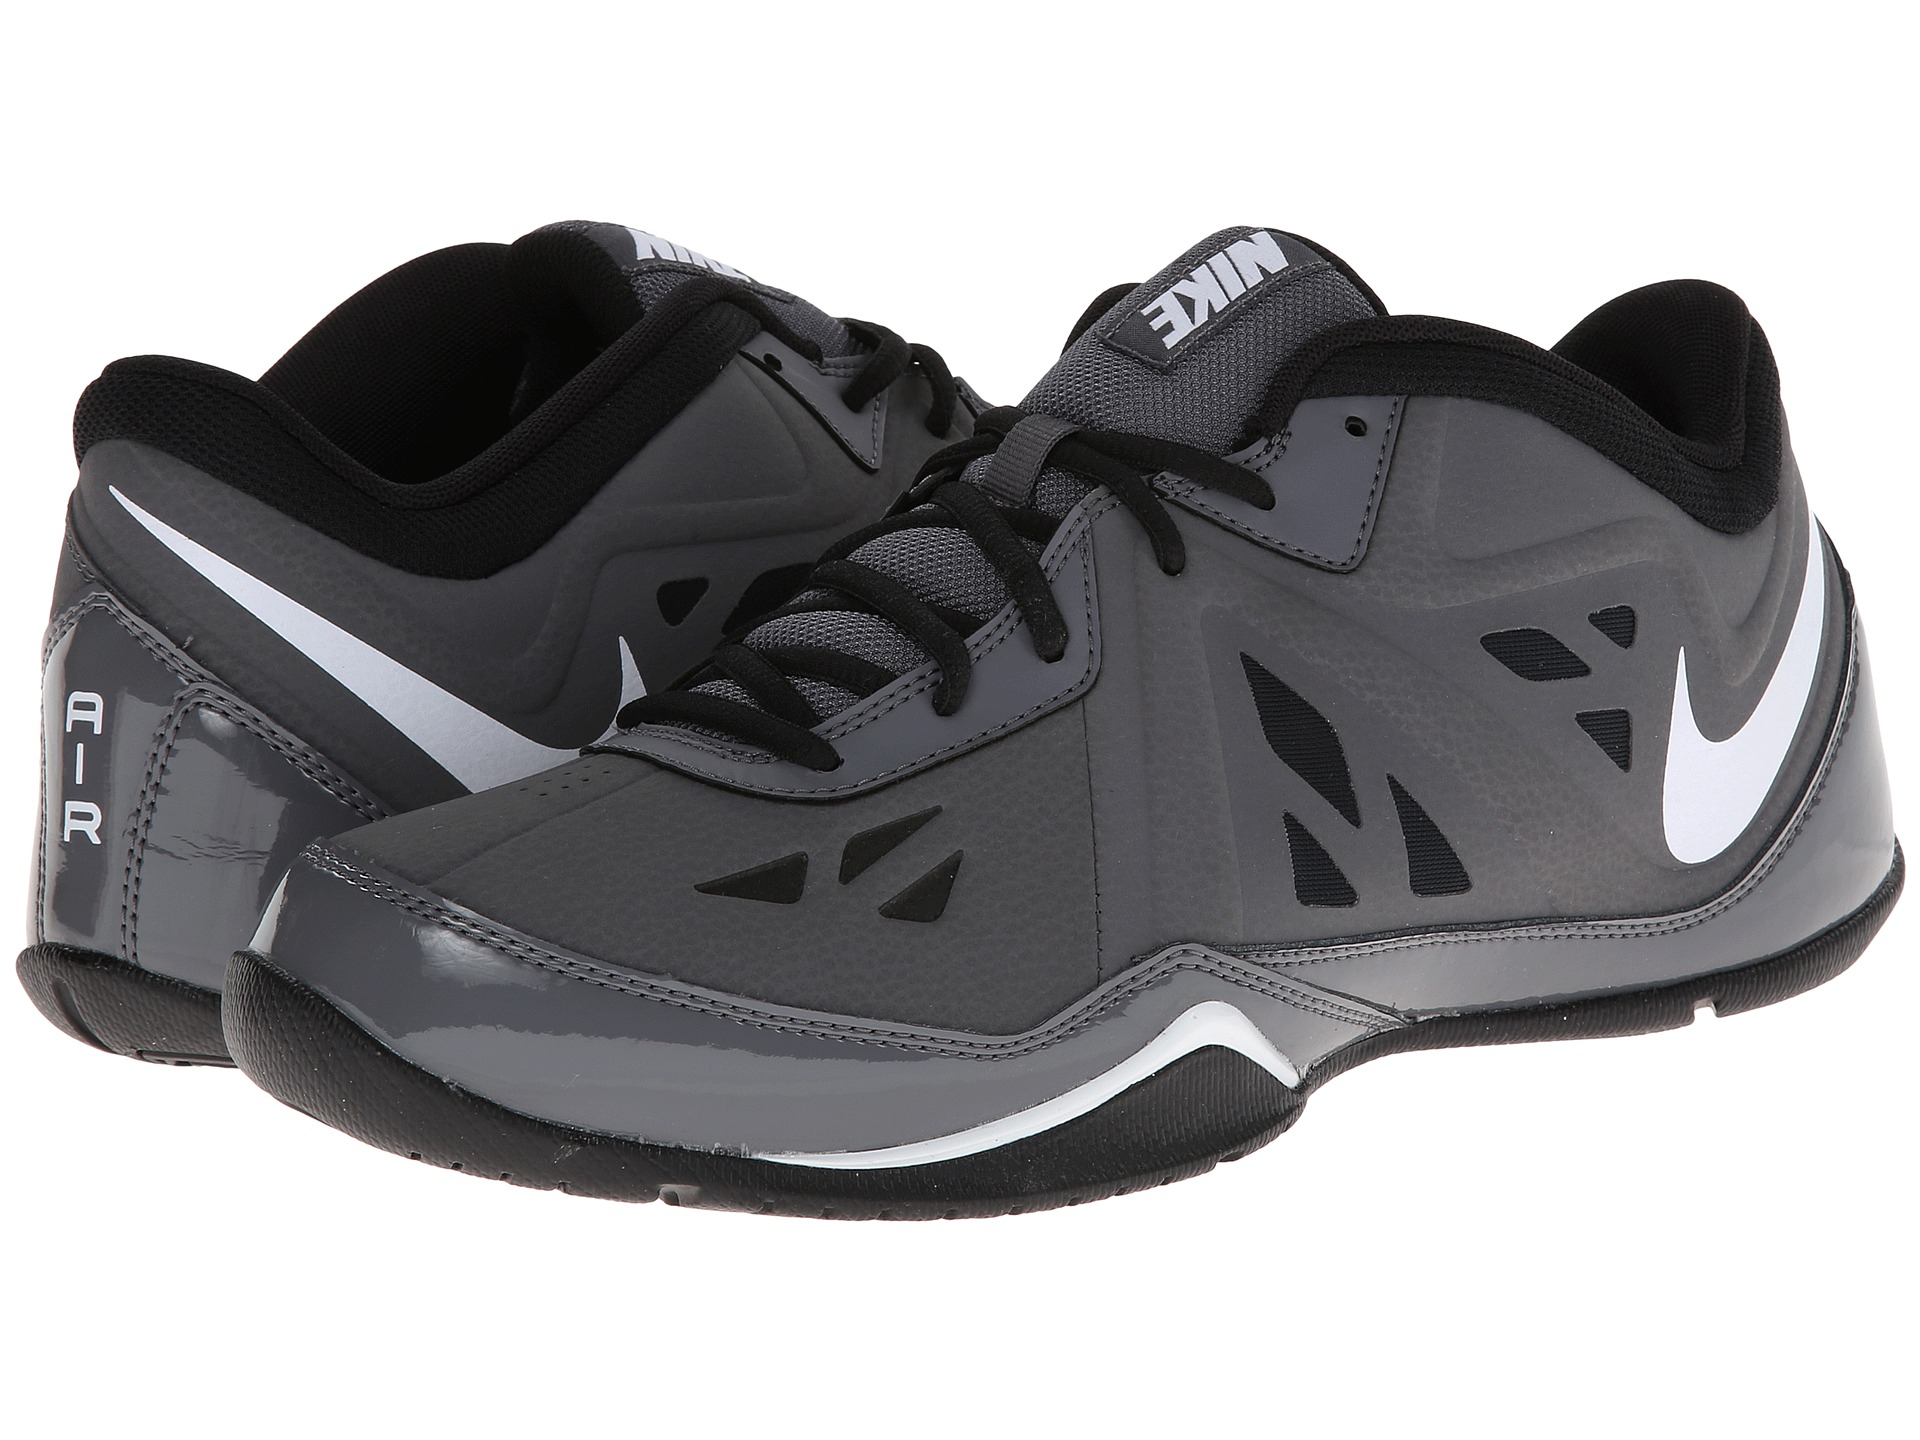 8d50ae92efb ... Lyst - Nike Air Ring Leader Low 2 Nbk in Gray for Men ...